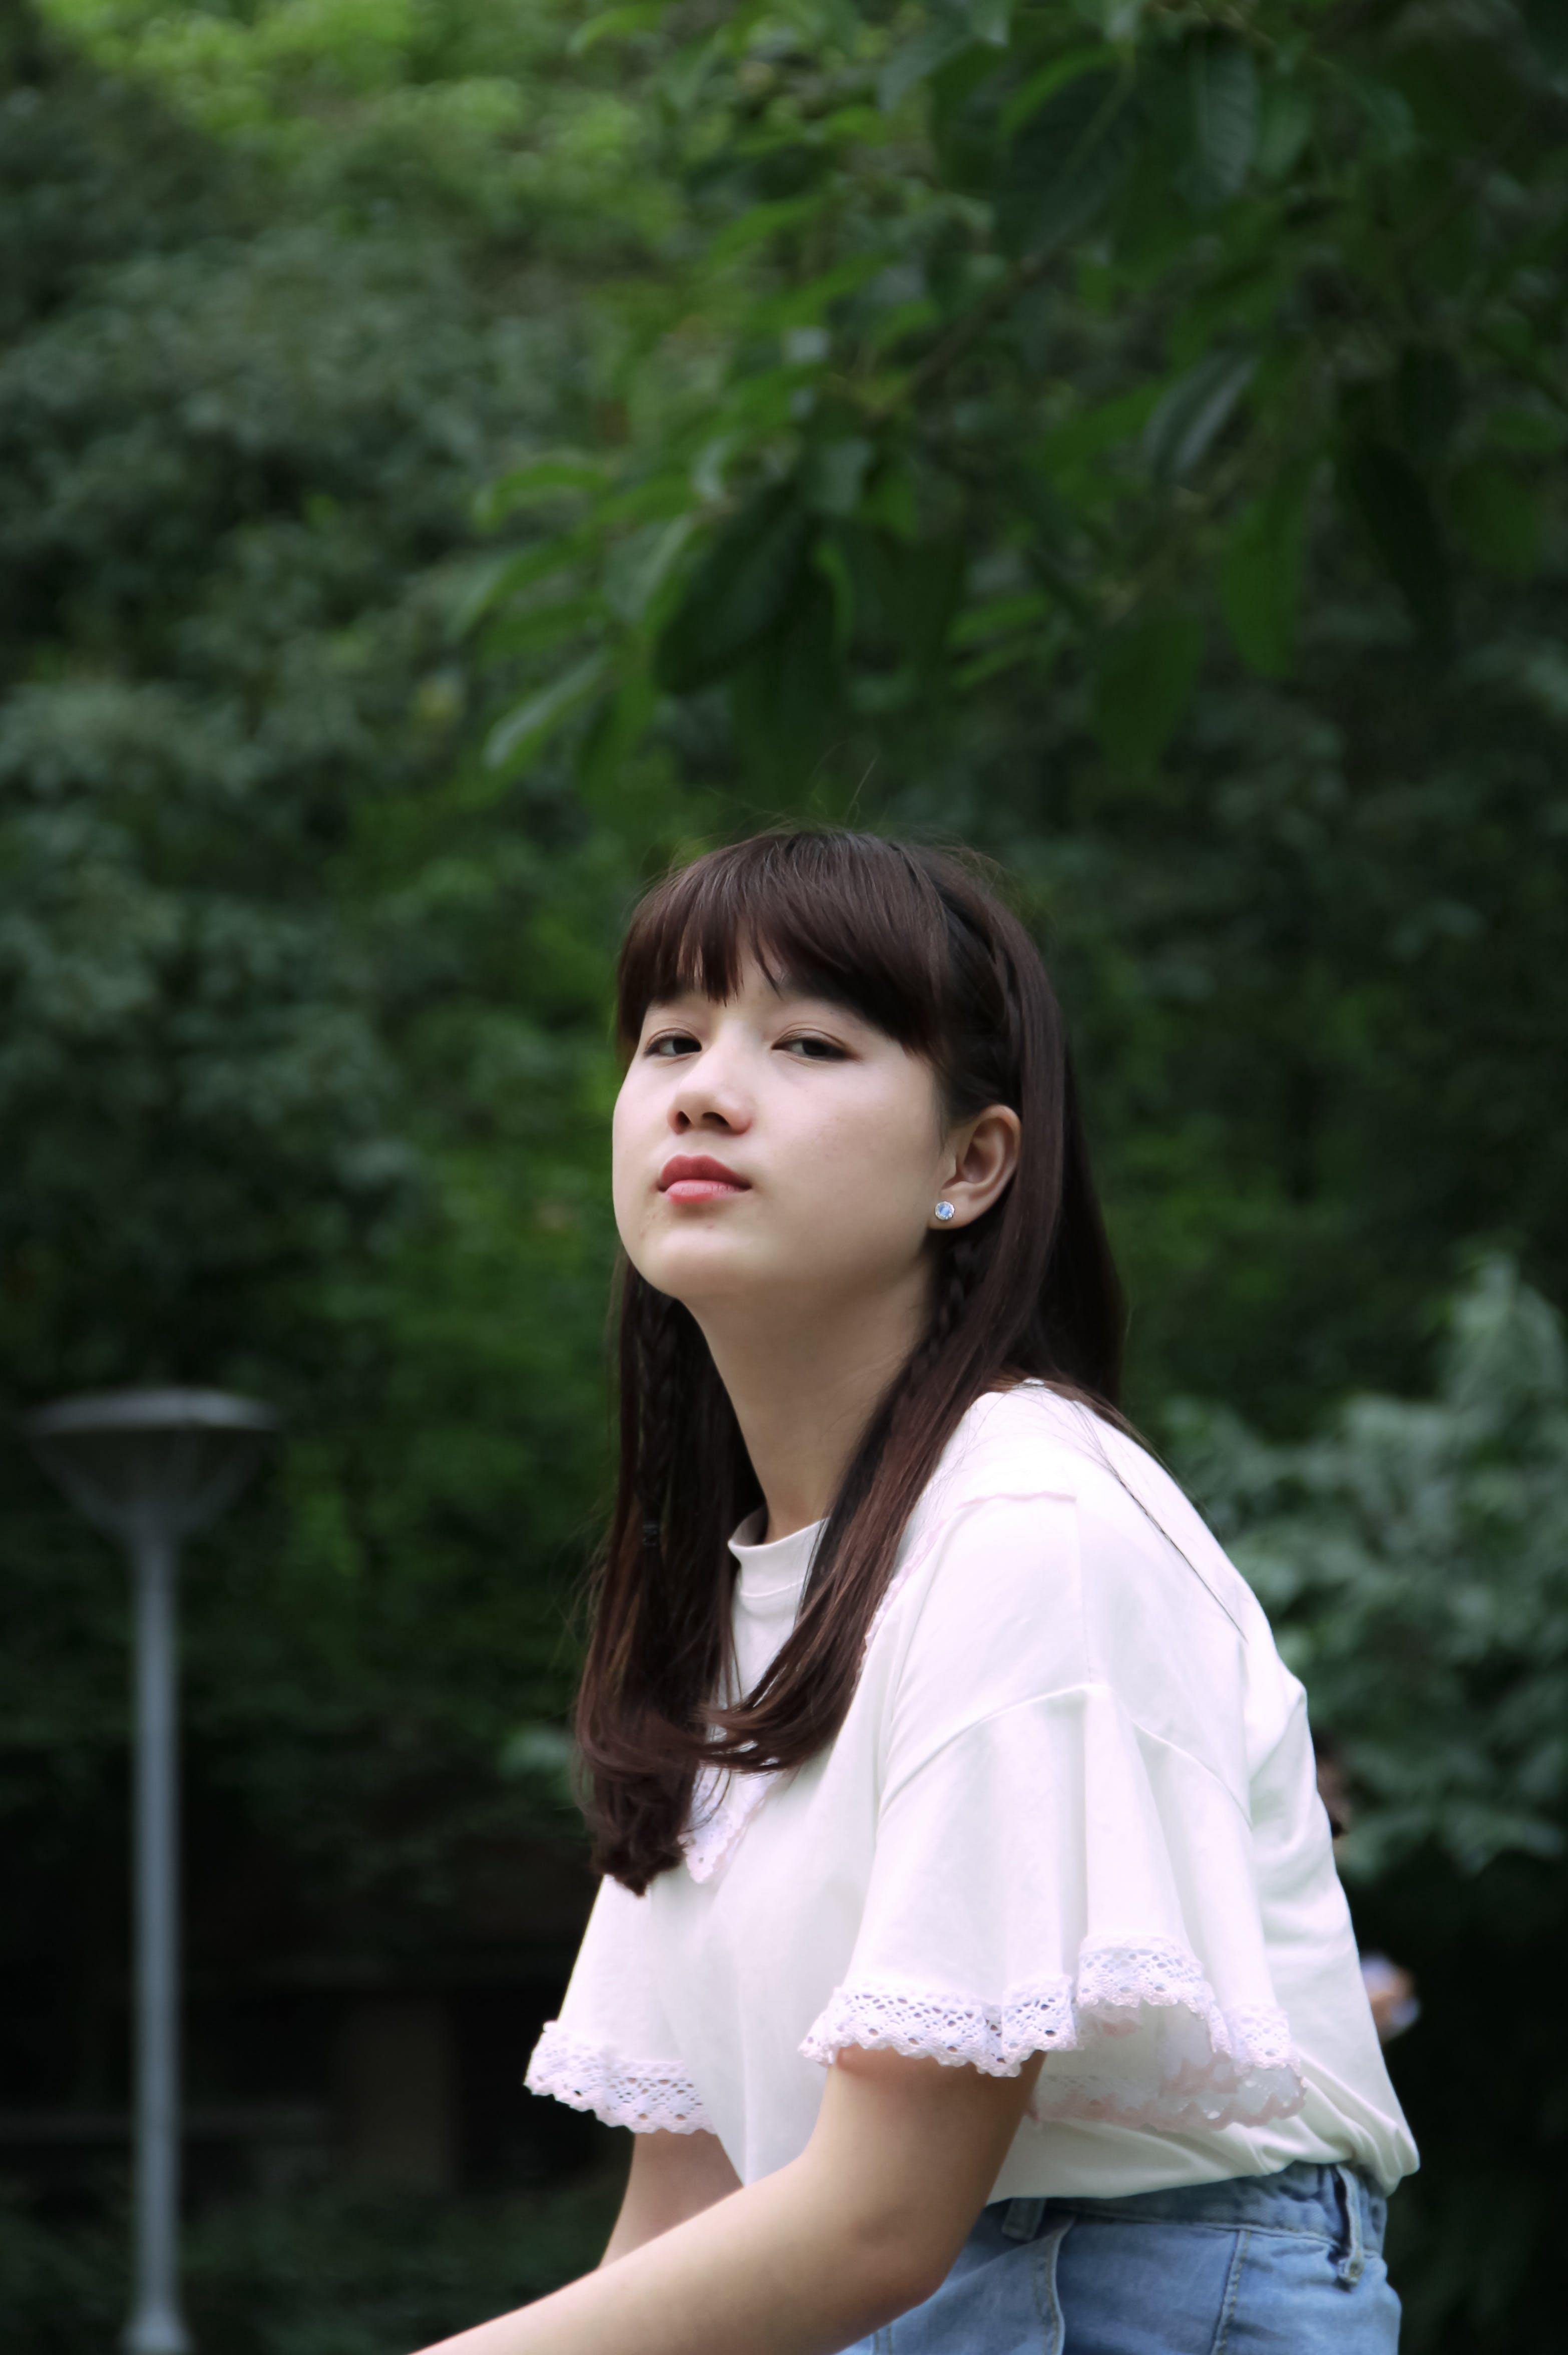 Free stock photo of asia, beauty, girls, portrait